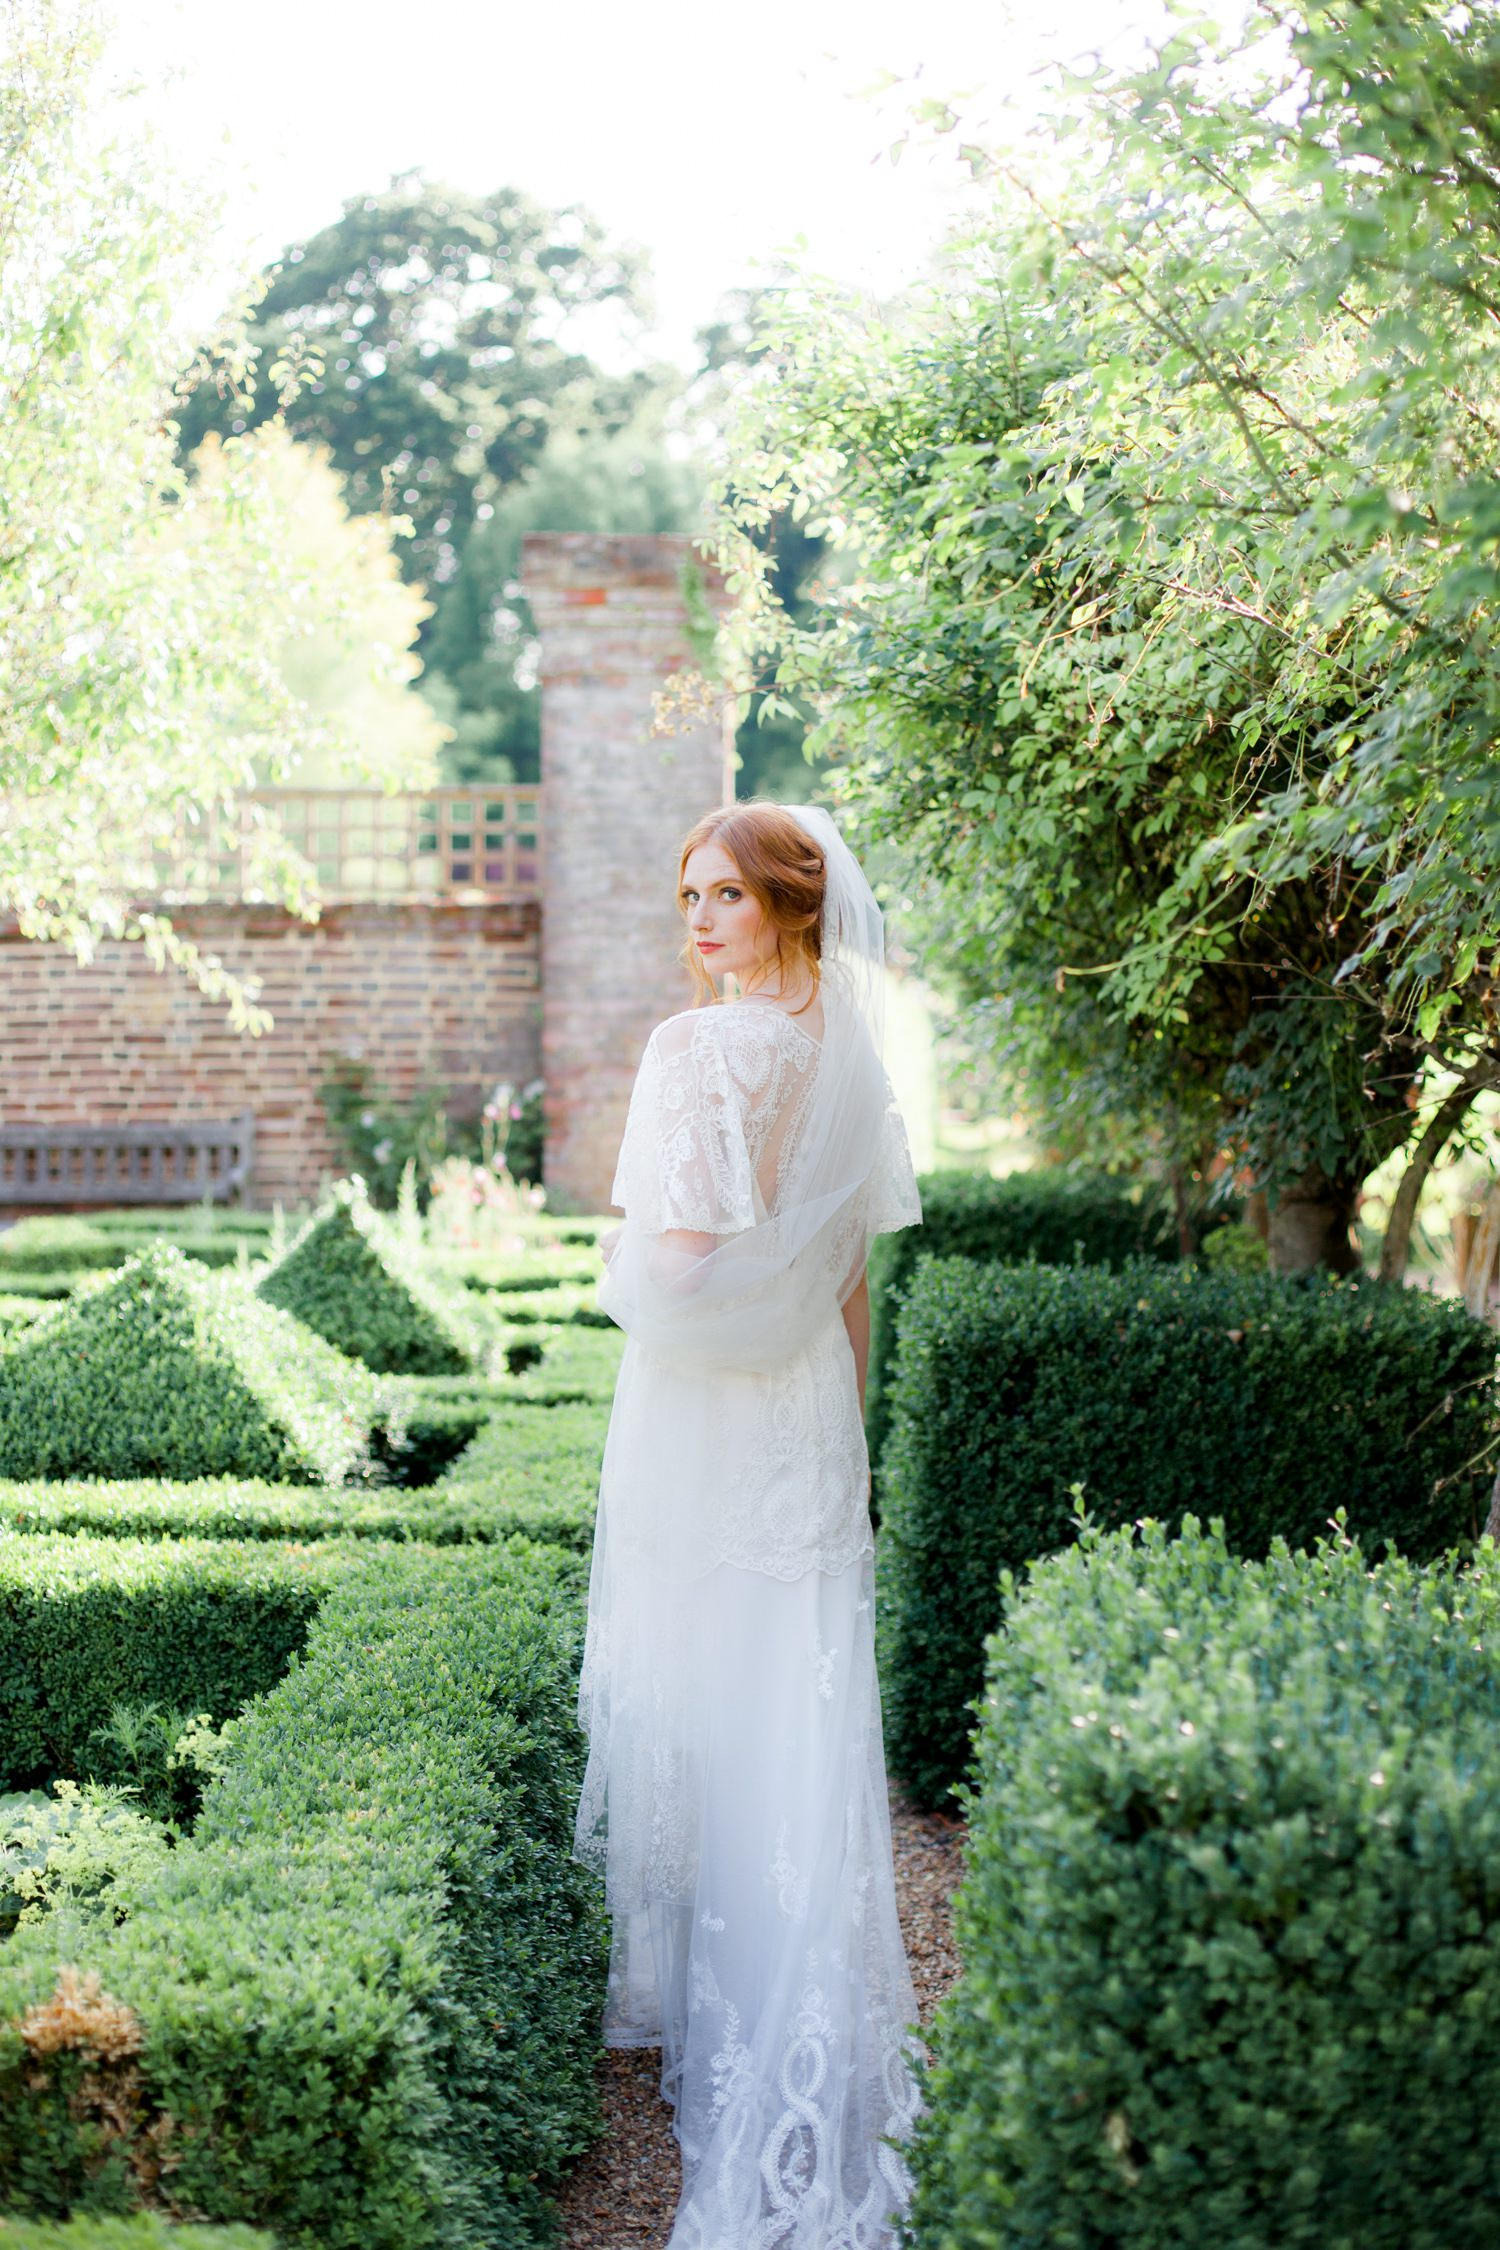 Wedding Inspiration at Bignor Park - West Sussex Wedding Photographer